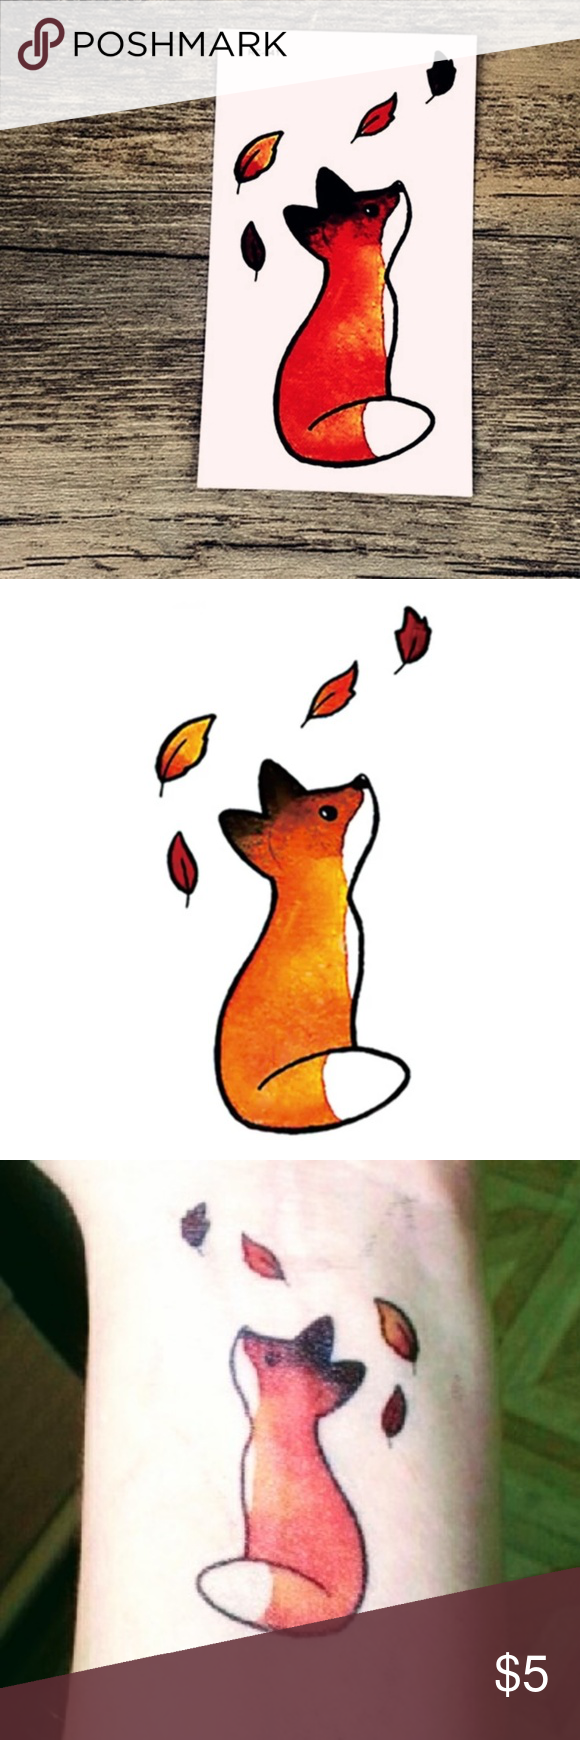 Watercolor Fox Temporary Tattoo Boutique   Watercolor fox ...